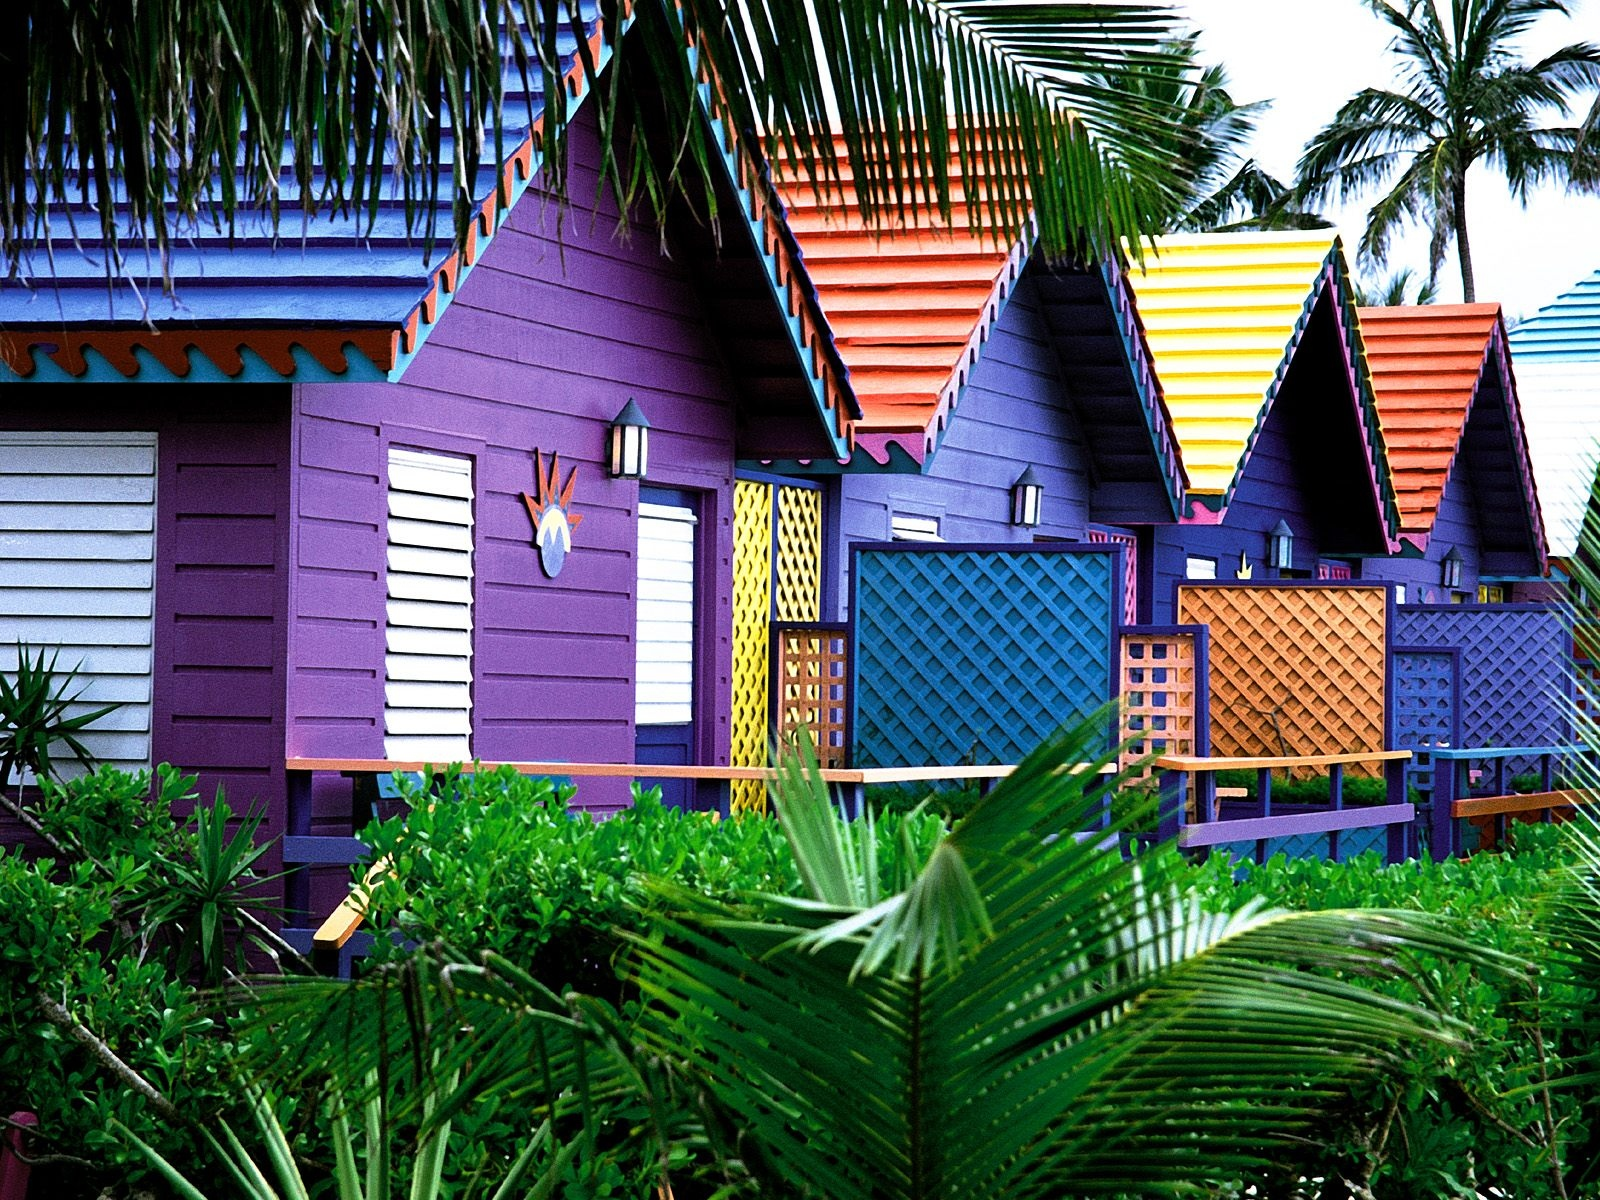 Desktop Wallpaper: Colorful Wood Cottages Desktop Wallpaper - photo#45